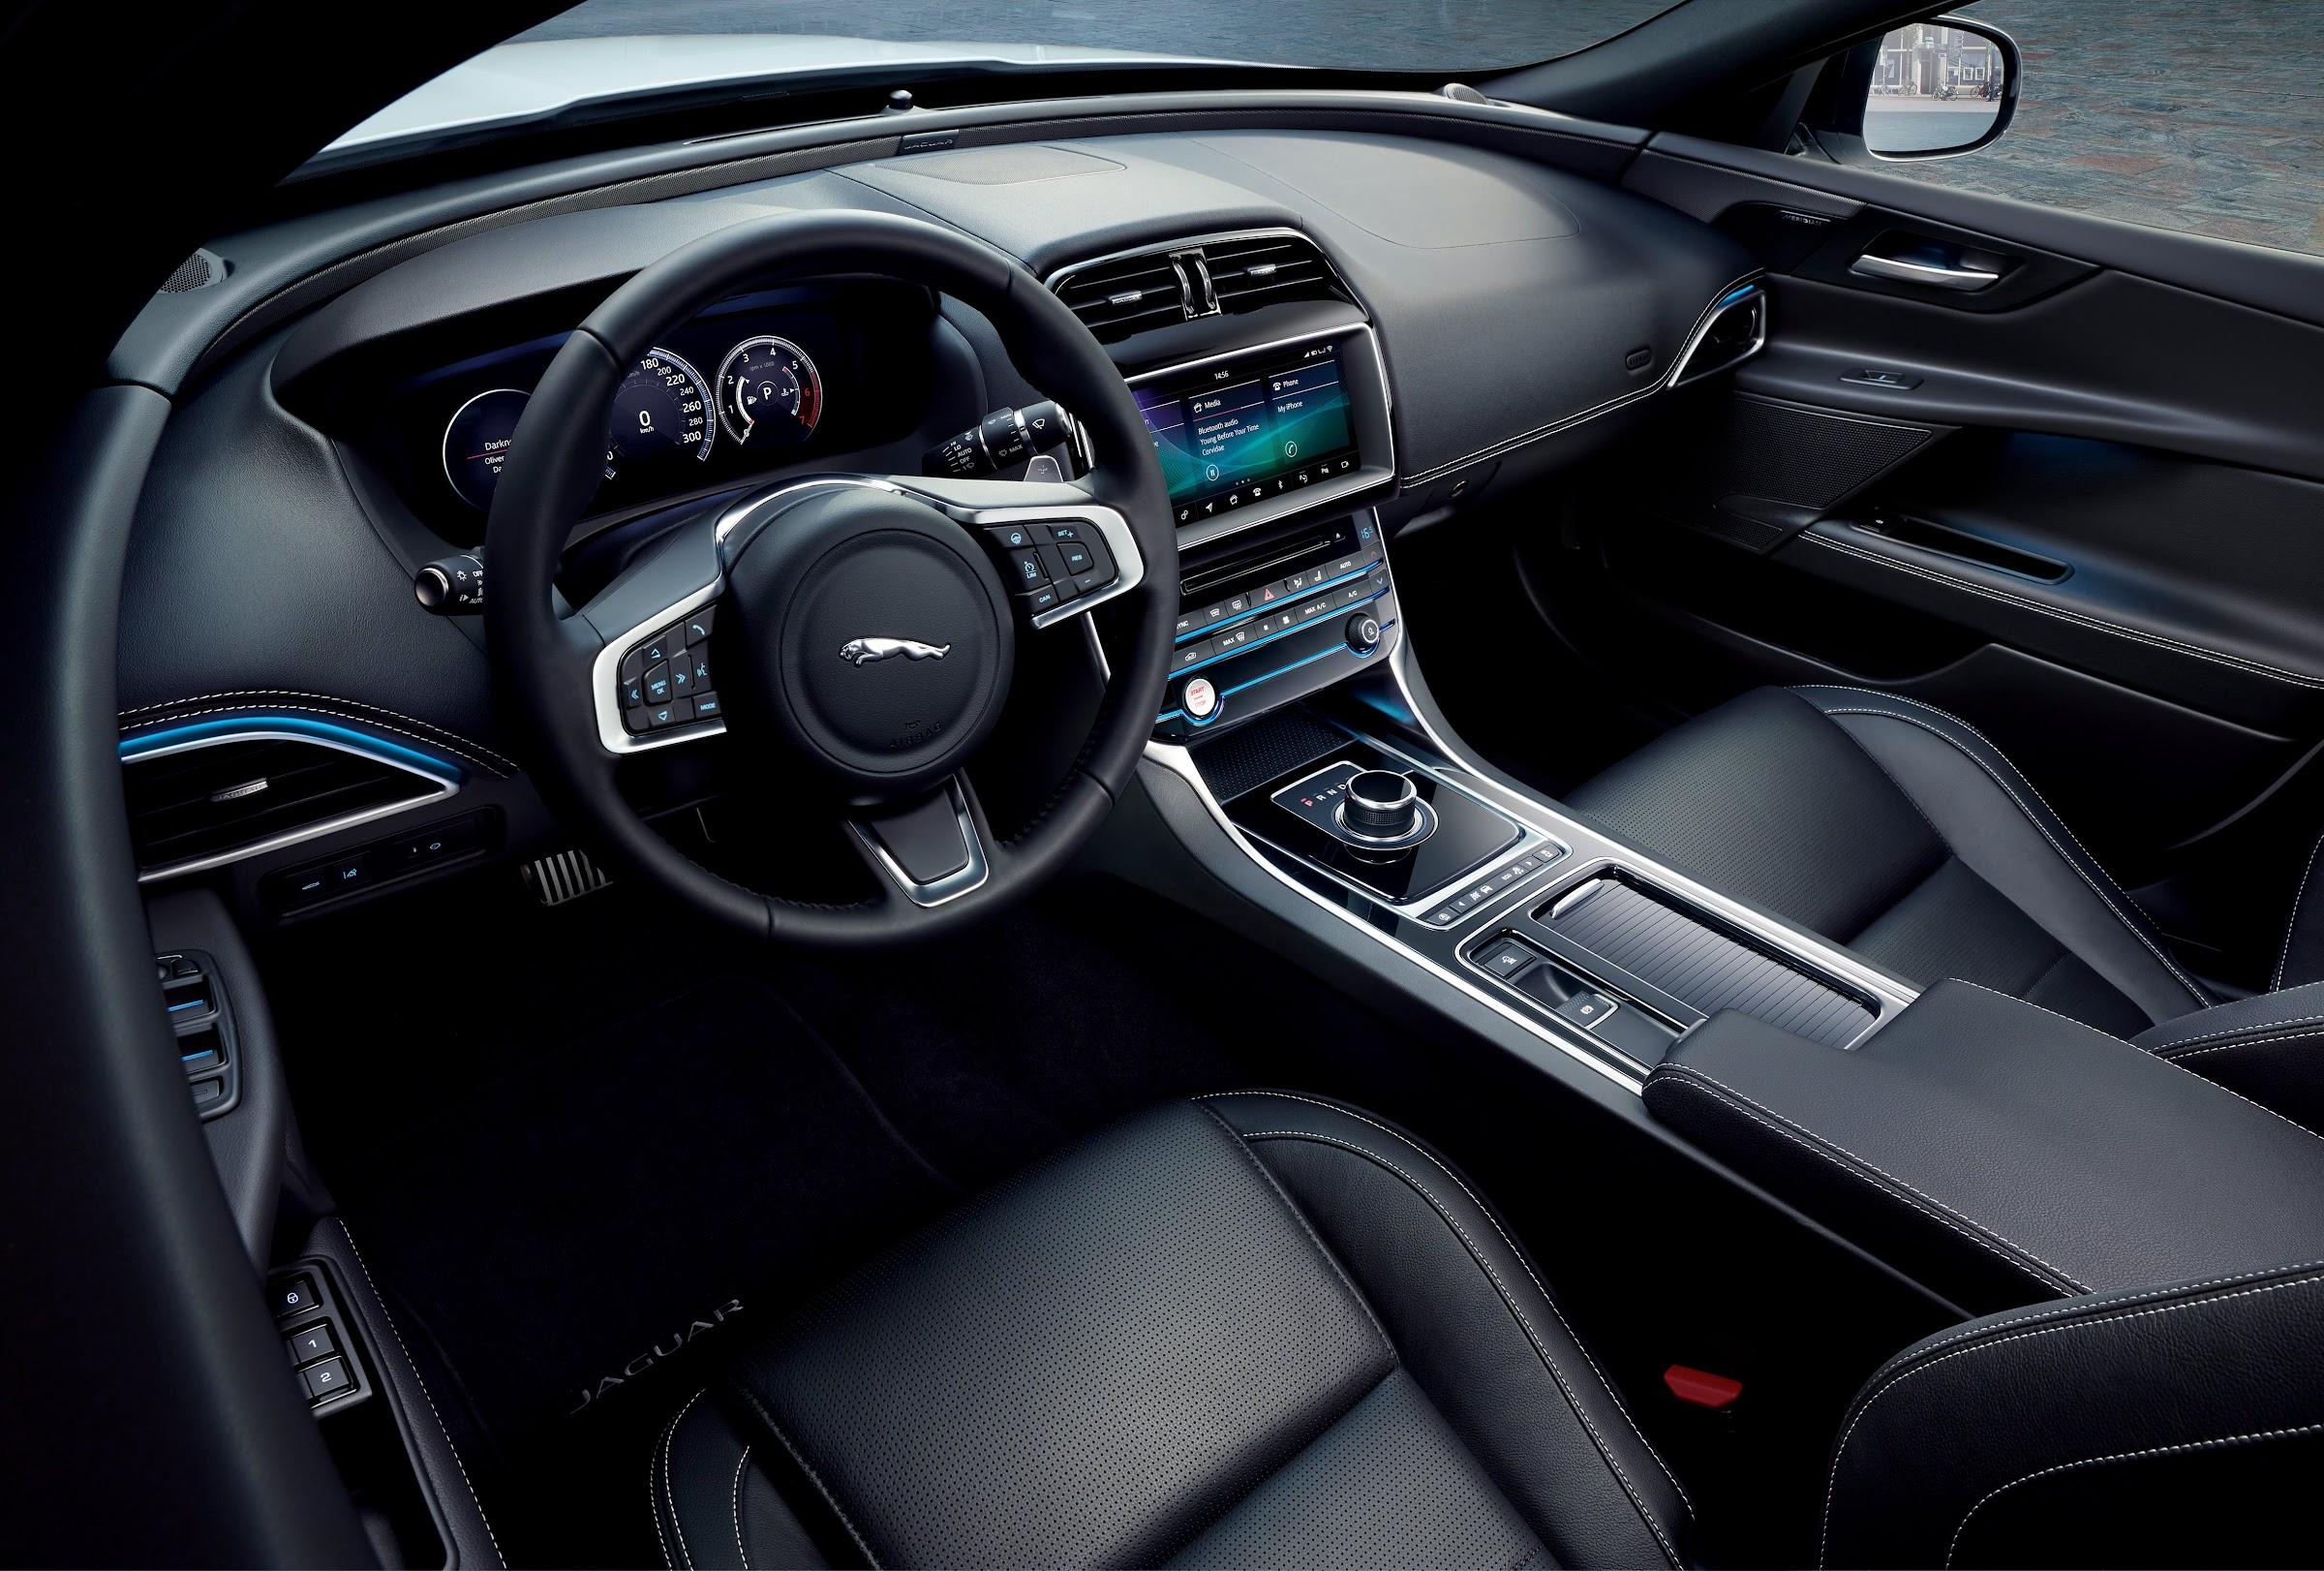 KXYBHaKSWMV8wXo Azu1pp1eSoPmZOwmyVzW2LeNQqCOqhMCTyuJLFaKGj0jStbjTdxehZNoG4HlsdMkXG8sgroESUaoS1Y7850uLZ97GzvarlTBfNoFKYyoTD7TX73oturDRxr8eA=w2400 - Nuevo acabado Landmark para el Jaguar XE